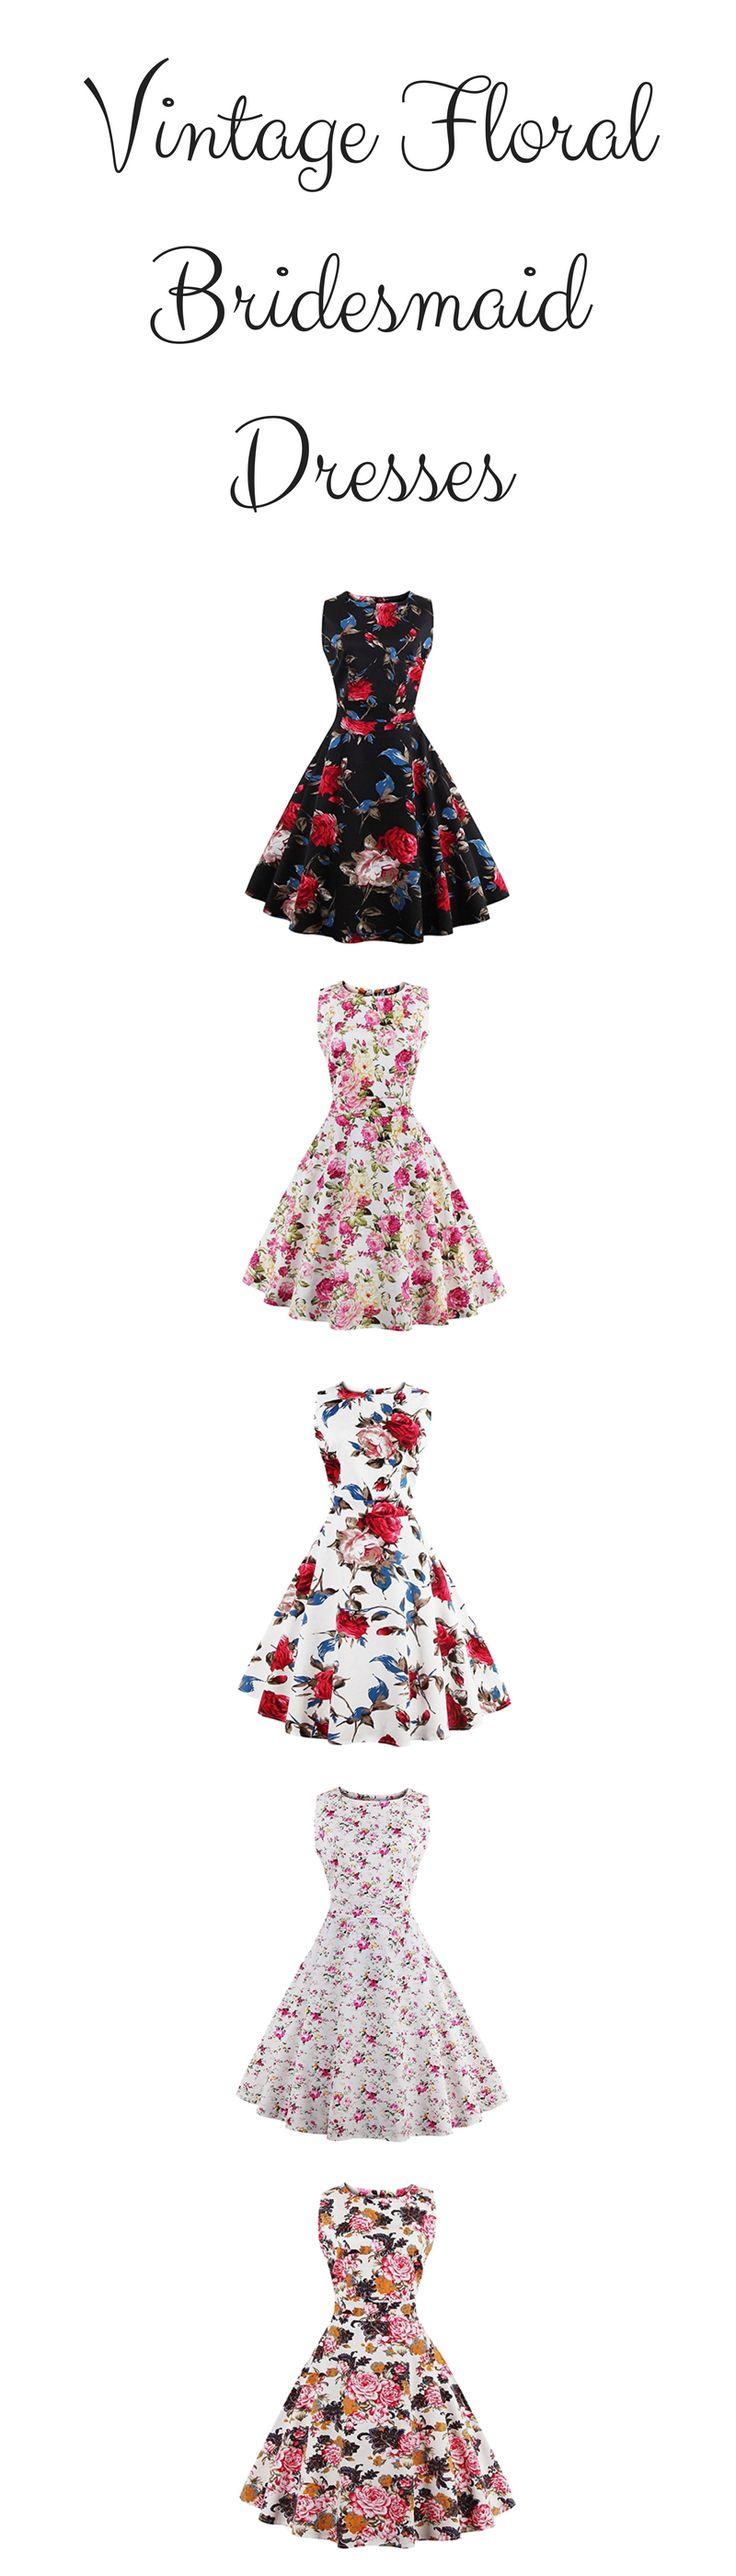 Cute vintage floral bridesmaid dresses with floral design and print - distribution_PO Womens Sleeveless Floral Bohemian 1950s Vintage Dresses Size S-4XL - https://www.amazon.com/distribution_PO-Sleeveless-Bohemian-Vintage-Dresses/dp/B0758HRXNJ/ref=as_li_ss_tl?_encoding=UTF8&refRID=3VZ8FQYRM29HDKXE28EM&th=1&linkCode=ll1&tag=theweddingclu-20&linkId=a9dc94c8e68afcdba0ca4a2844e369b6